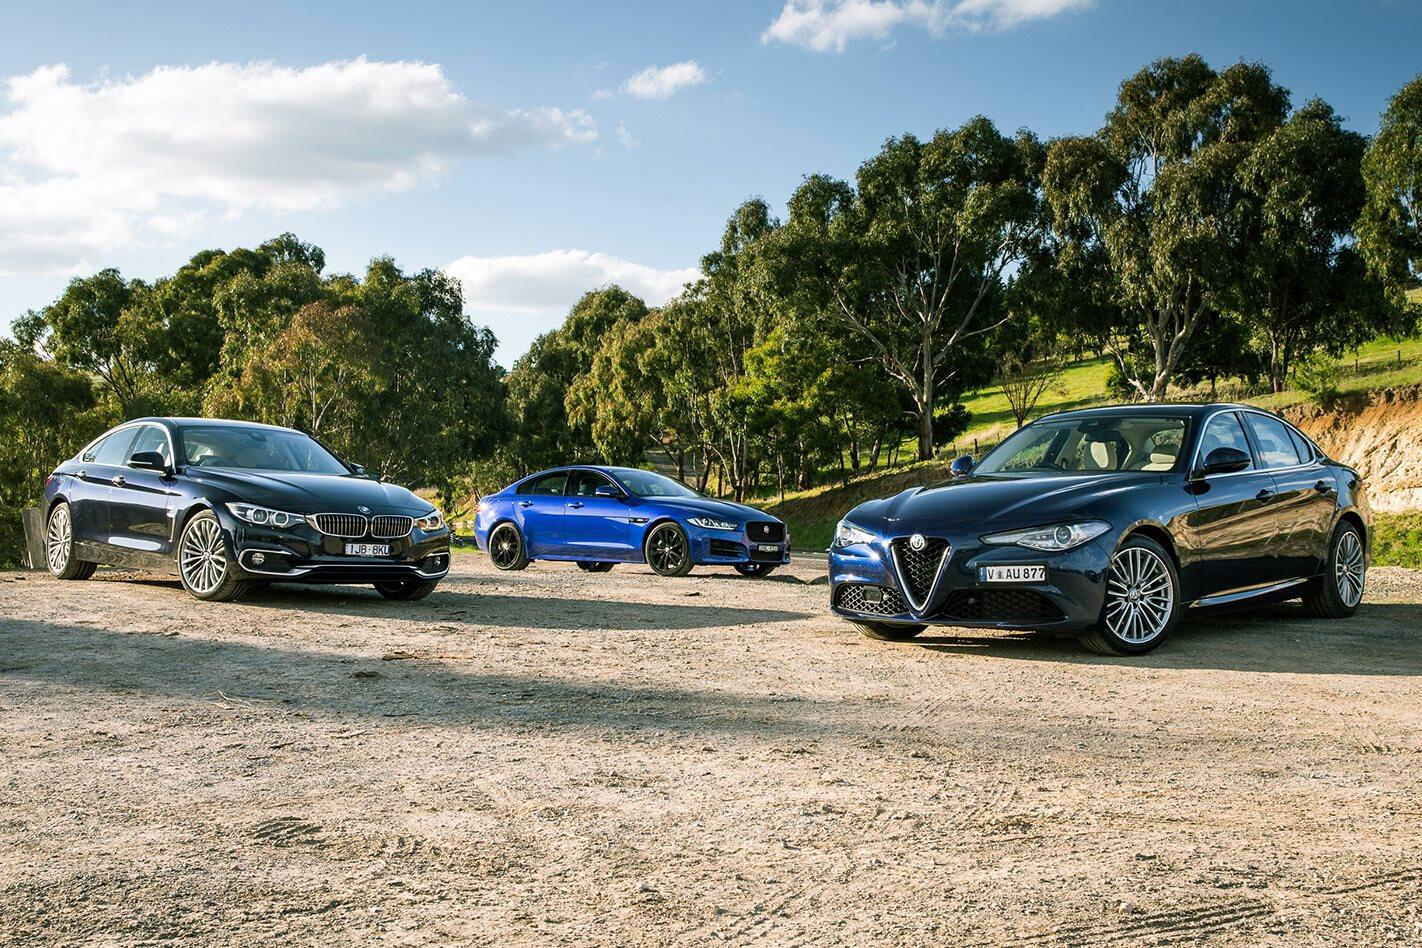 Alfa Romeo Giulia Super v Jaguar XE 25t R-Sport v BMW 420i Gran Coupe comparison